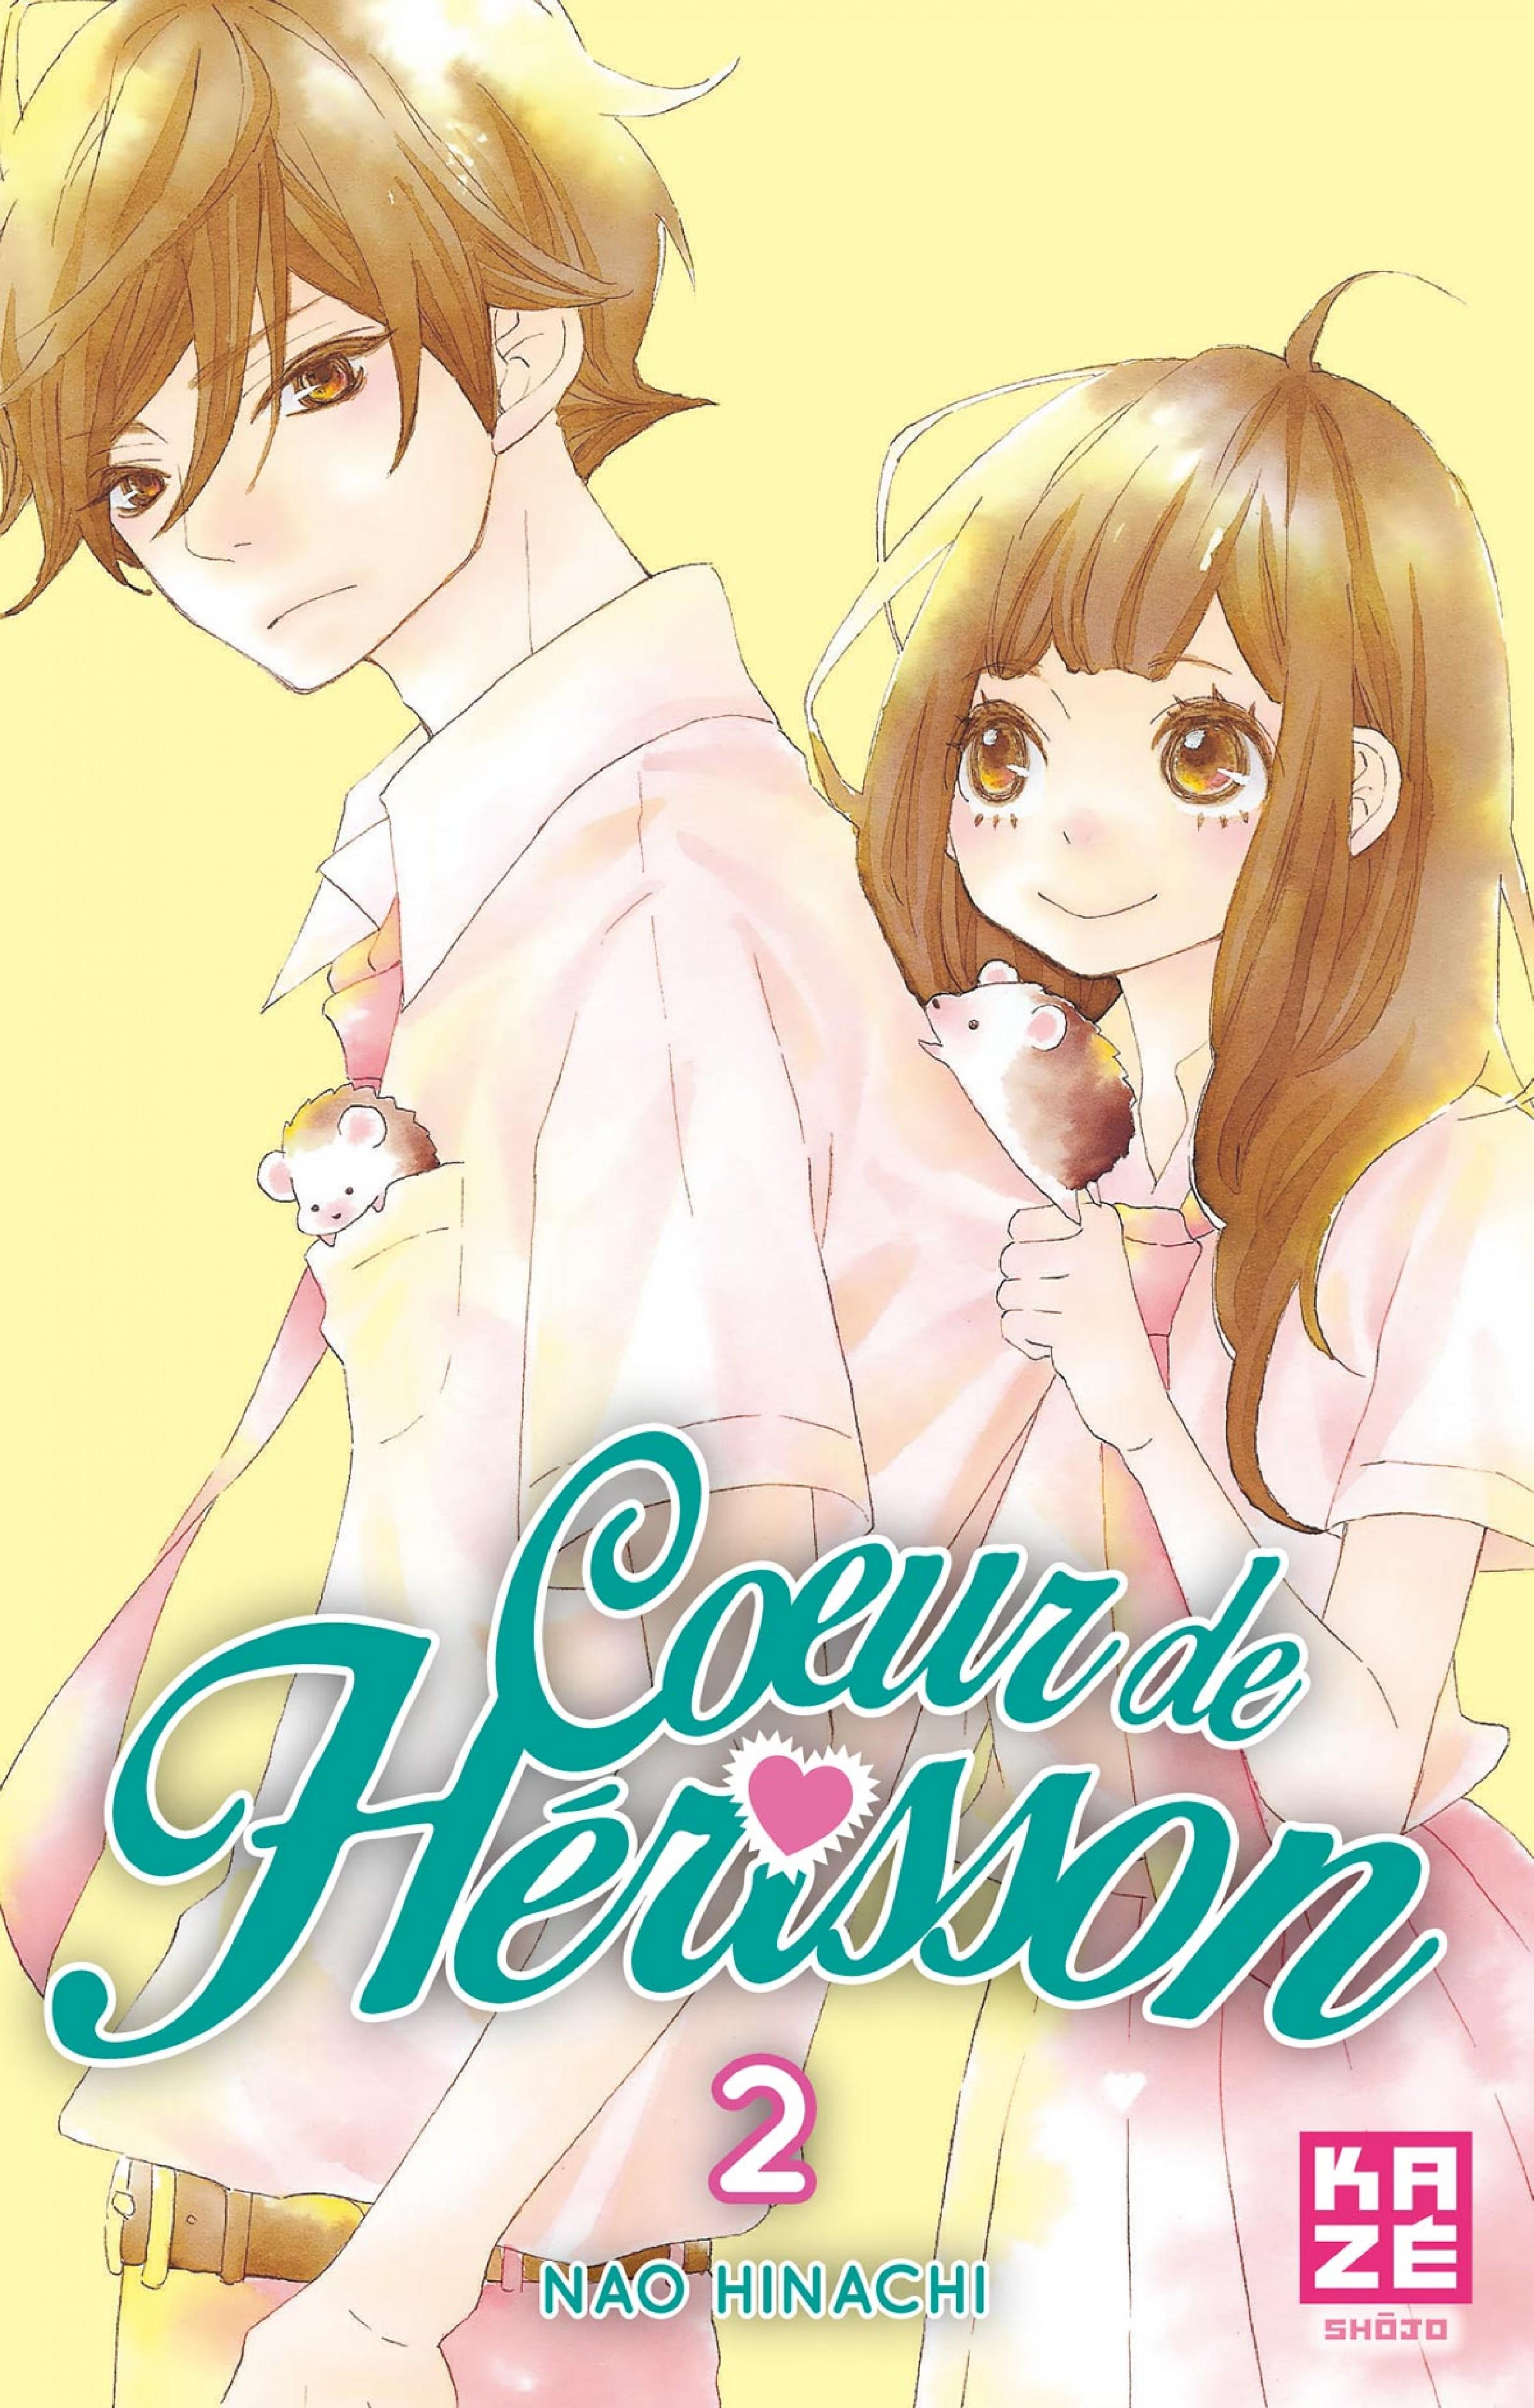 Coeur de Herisson - Tome 2 ...